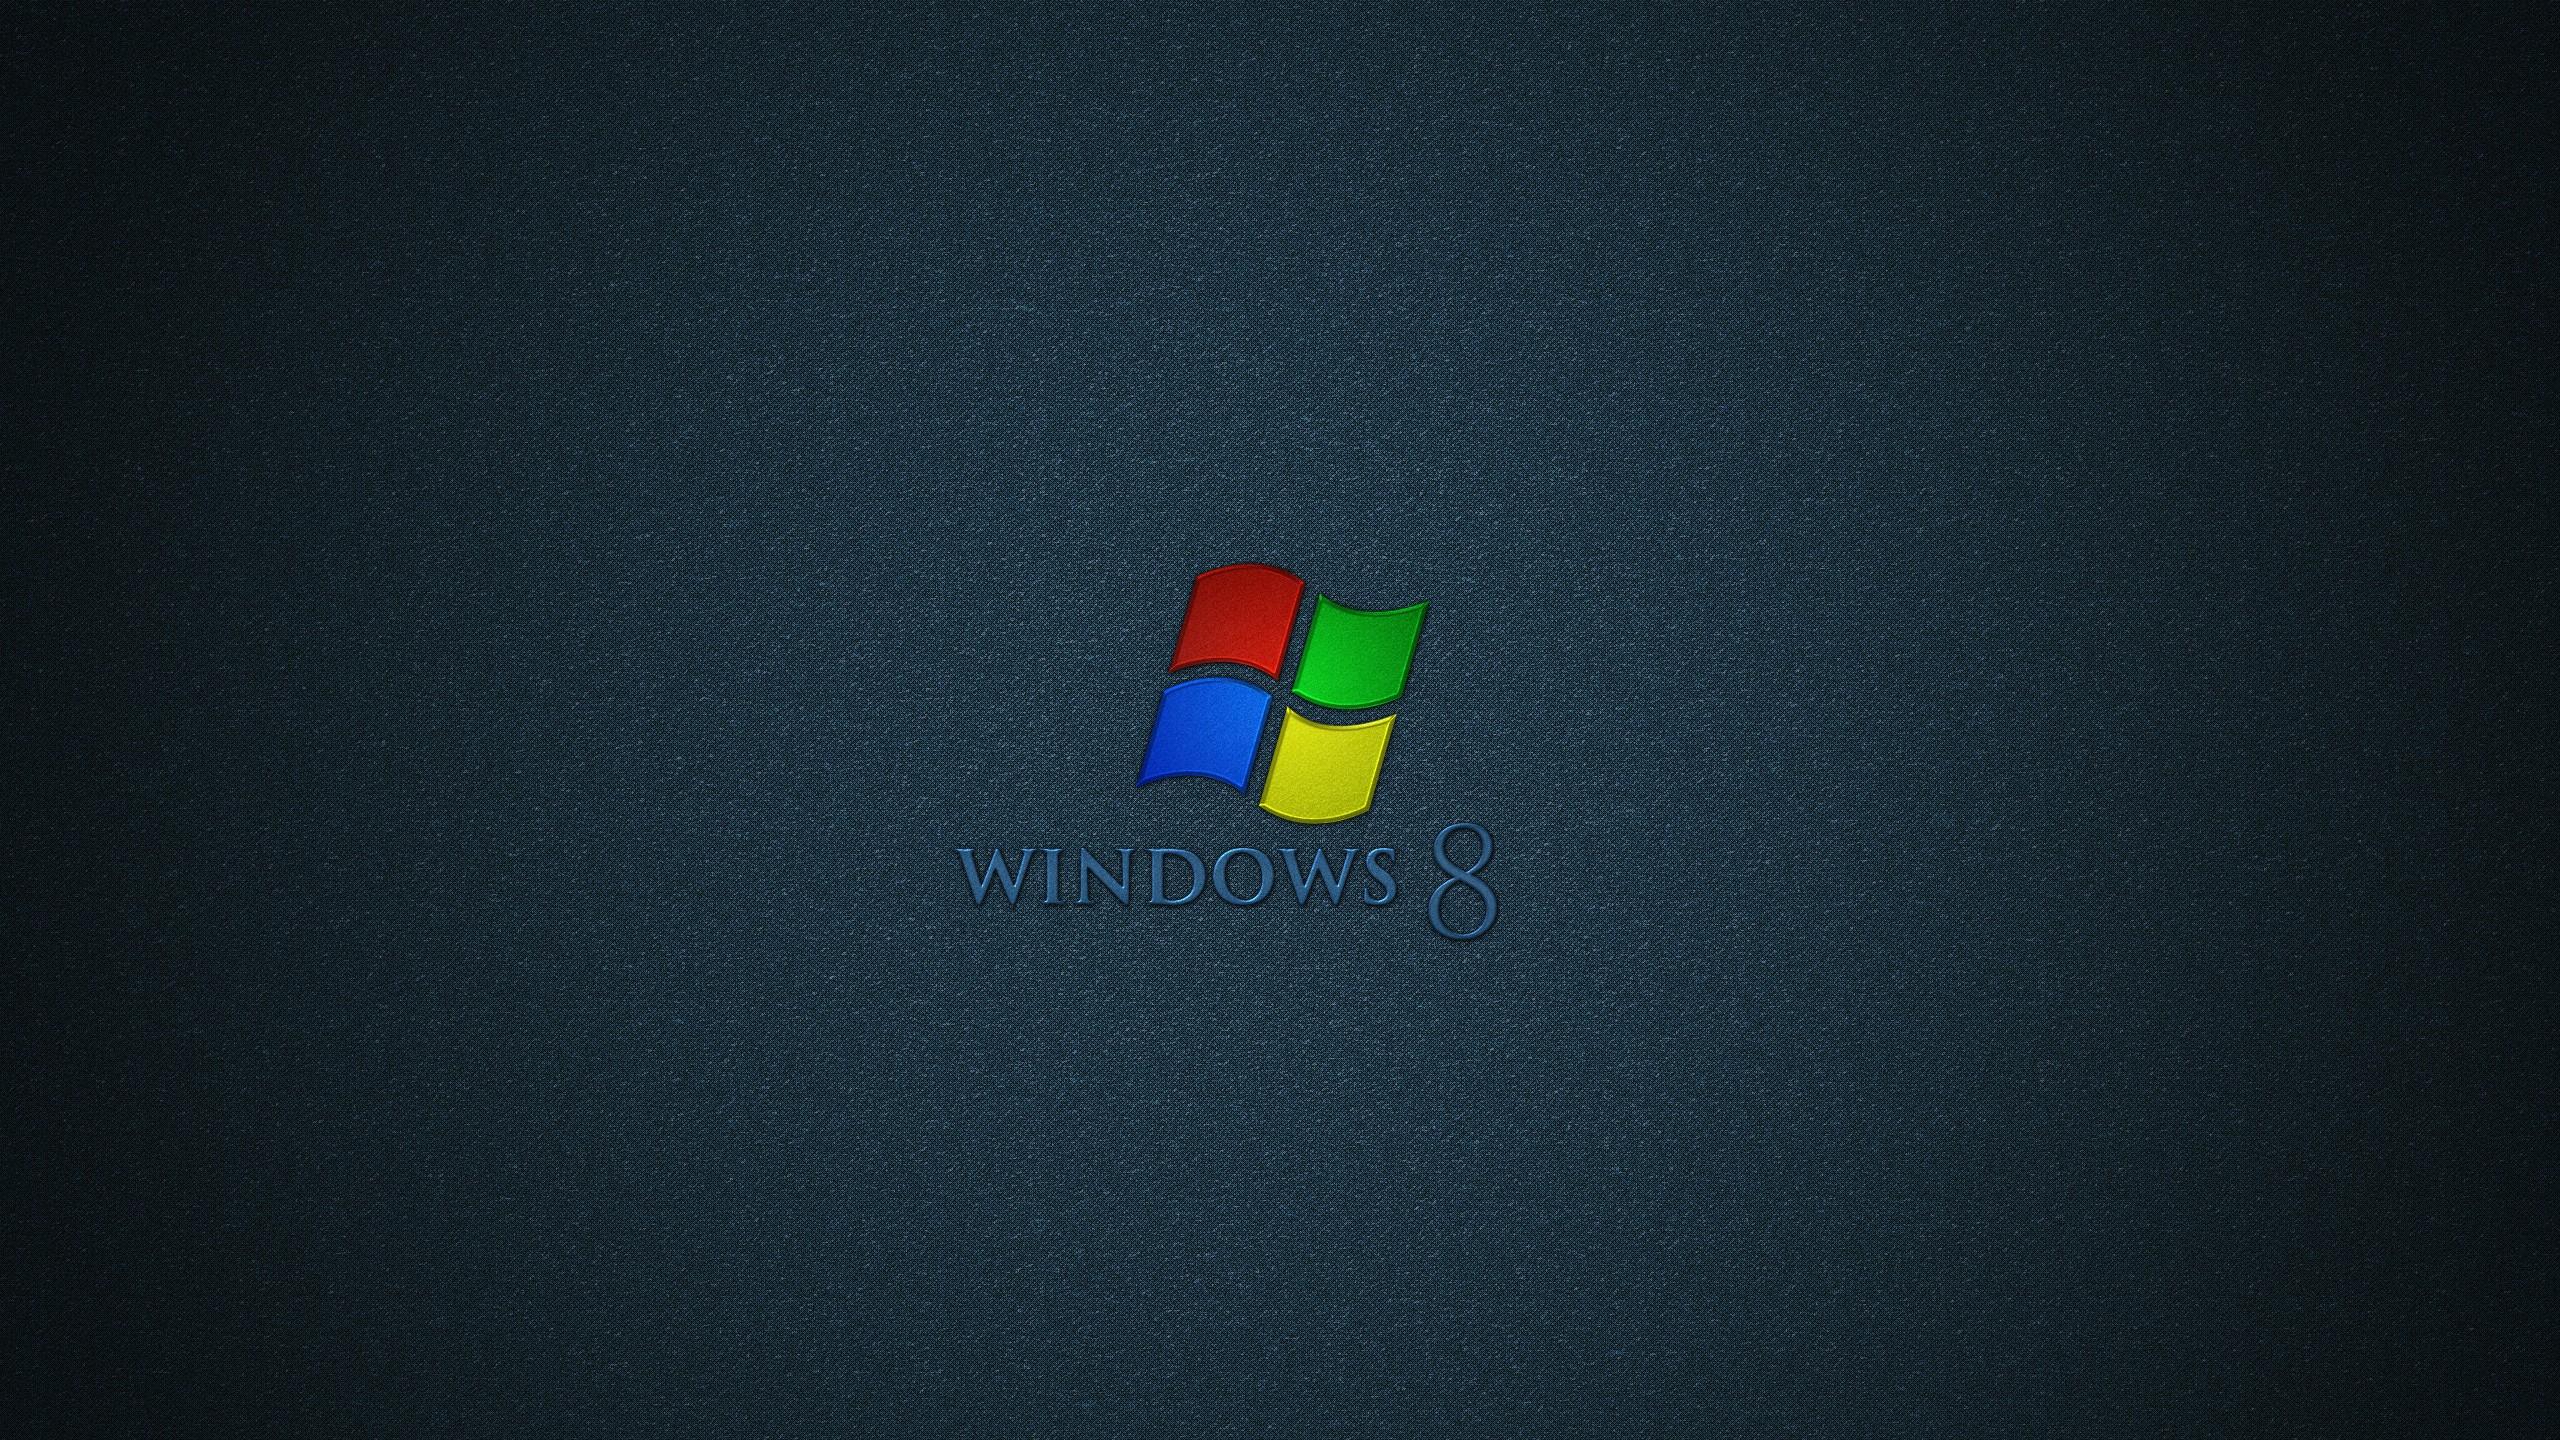 Windows8-Wallpapers-HD (7)